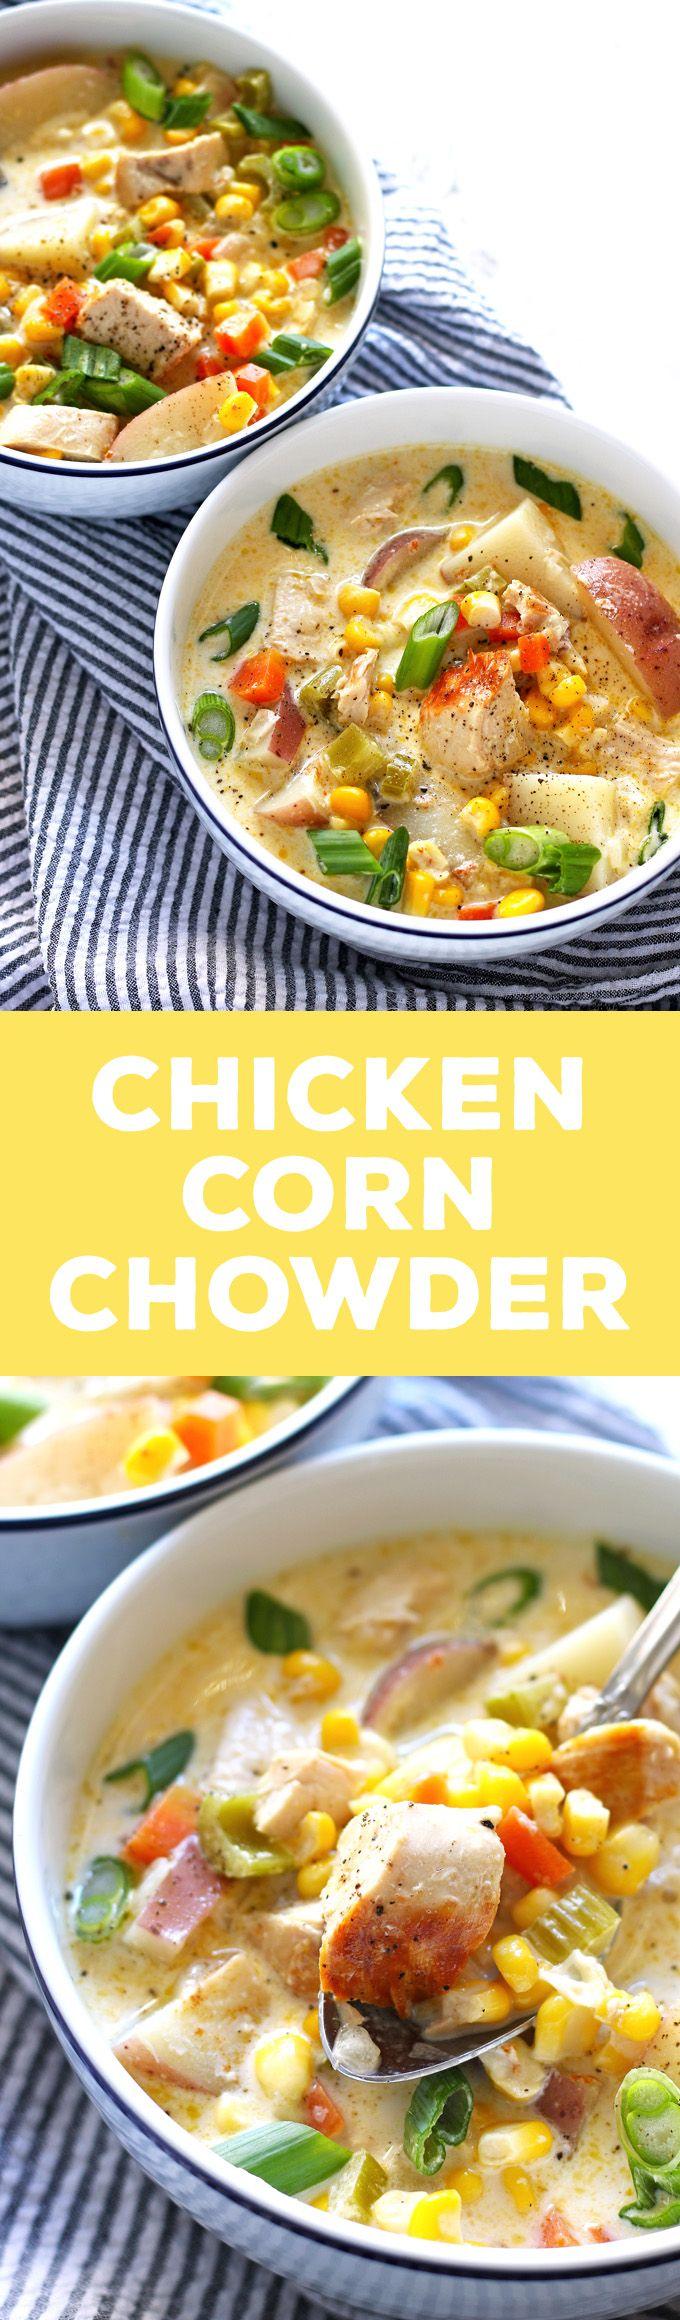 Honey and Birch / Chicken Corn Chowder